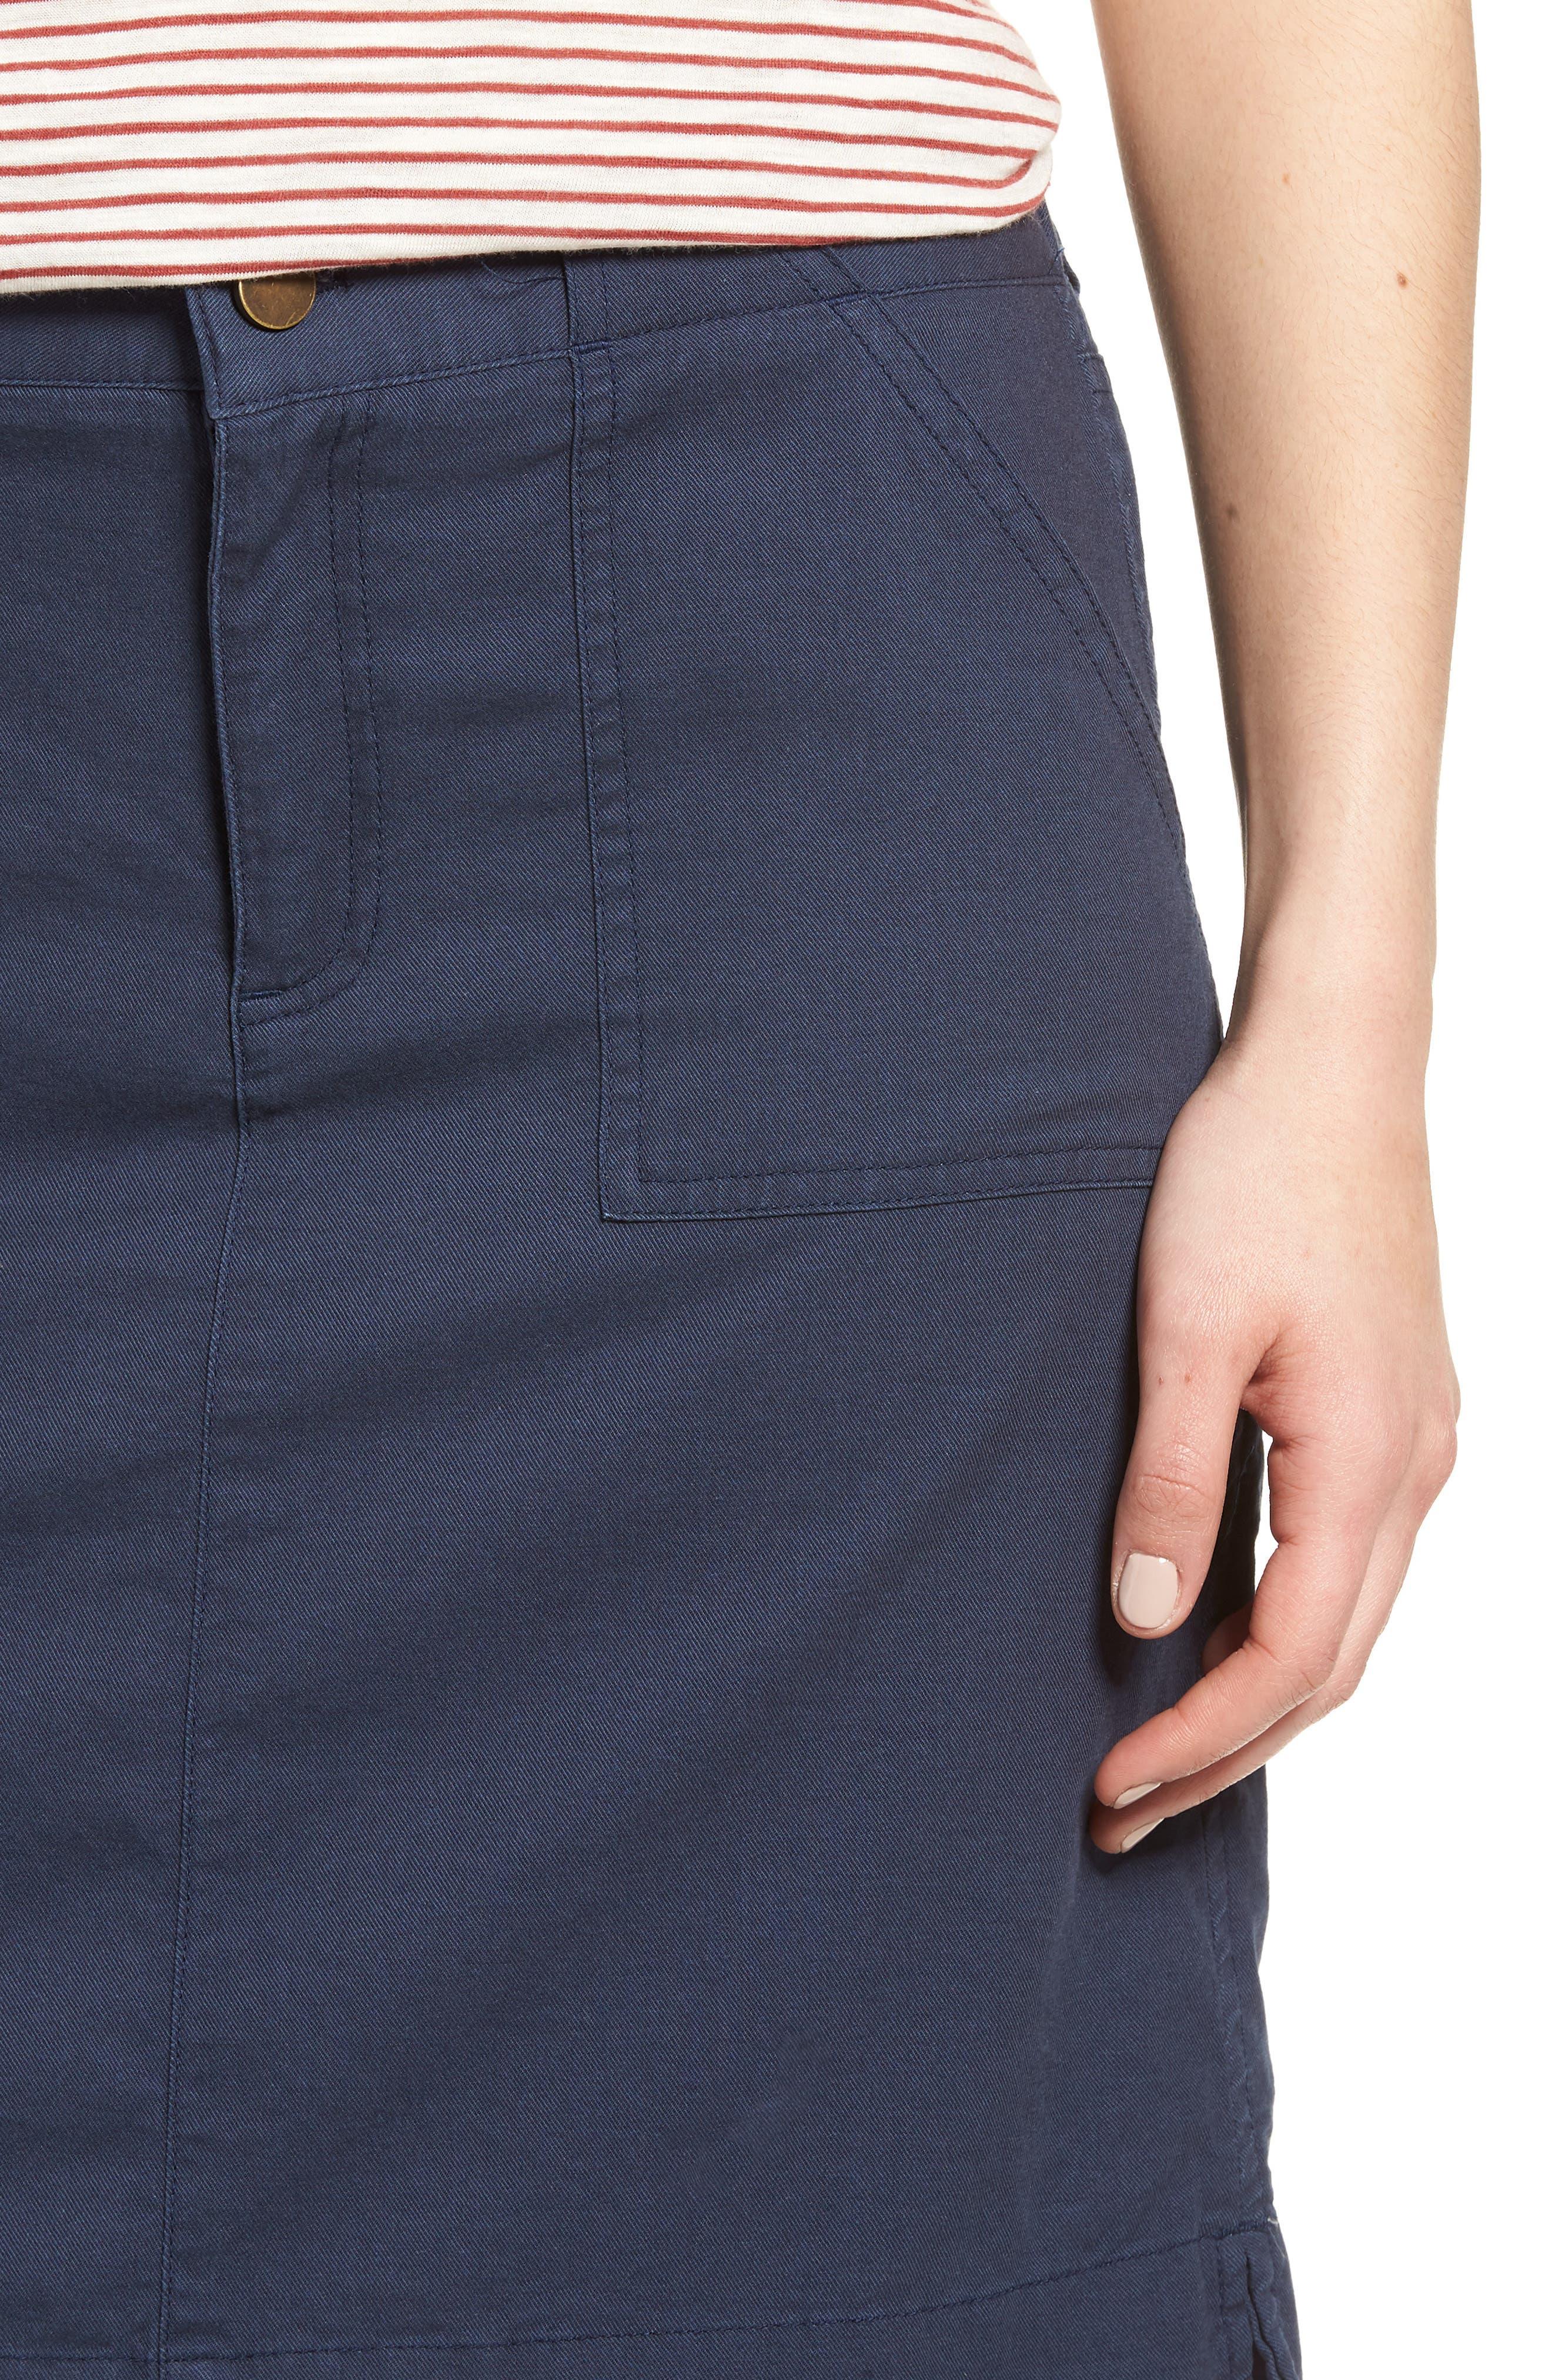 Twill Utility Skirt,                             Alternate thumbnail 4, color,                             Navy Indigo